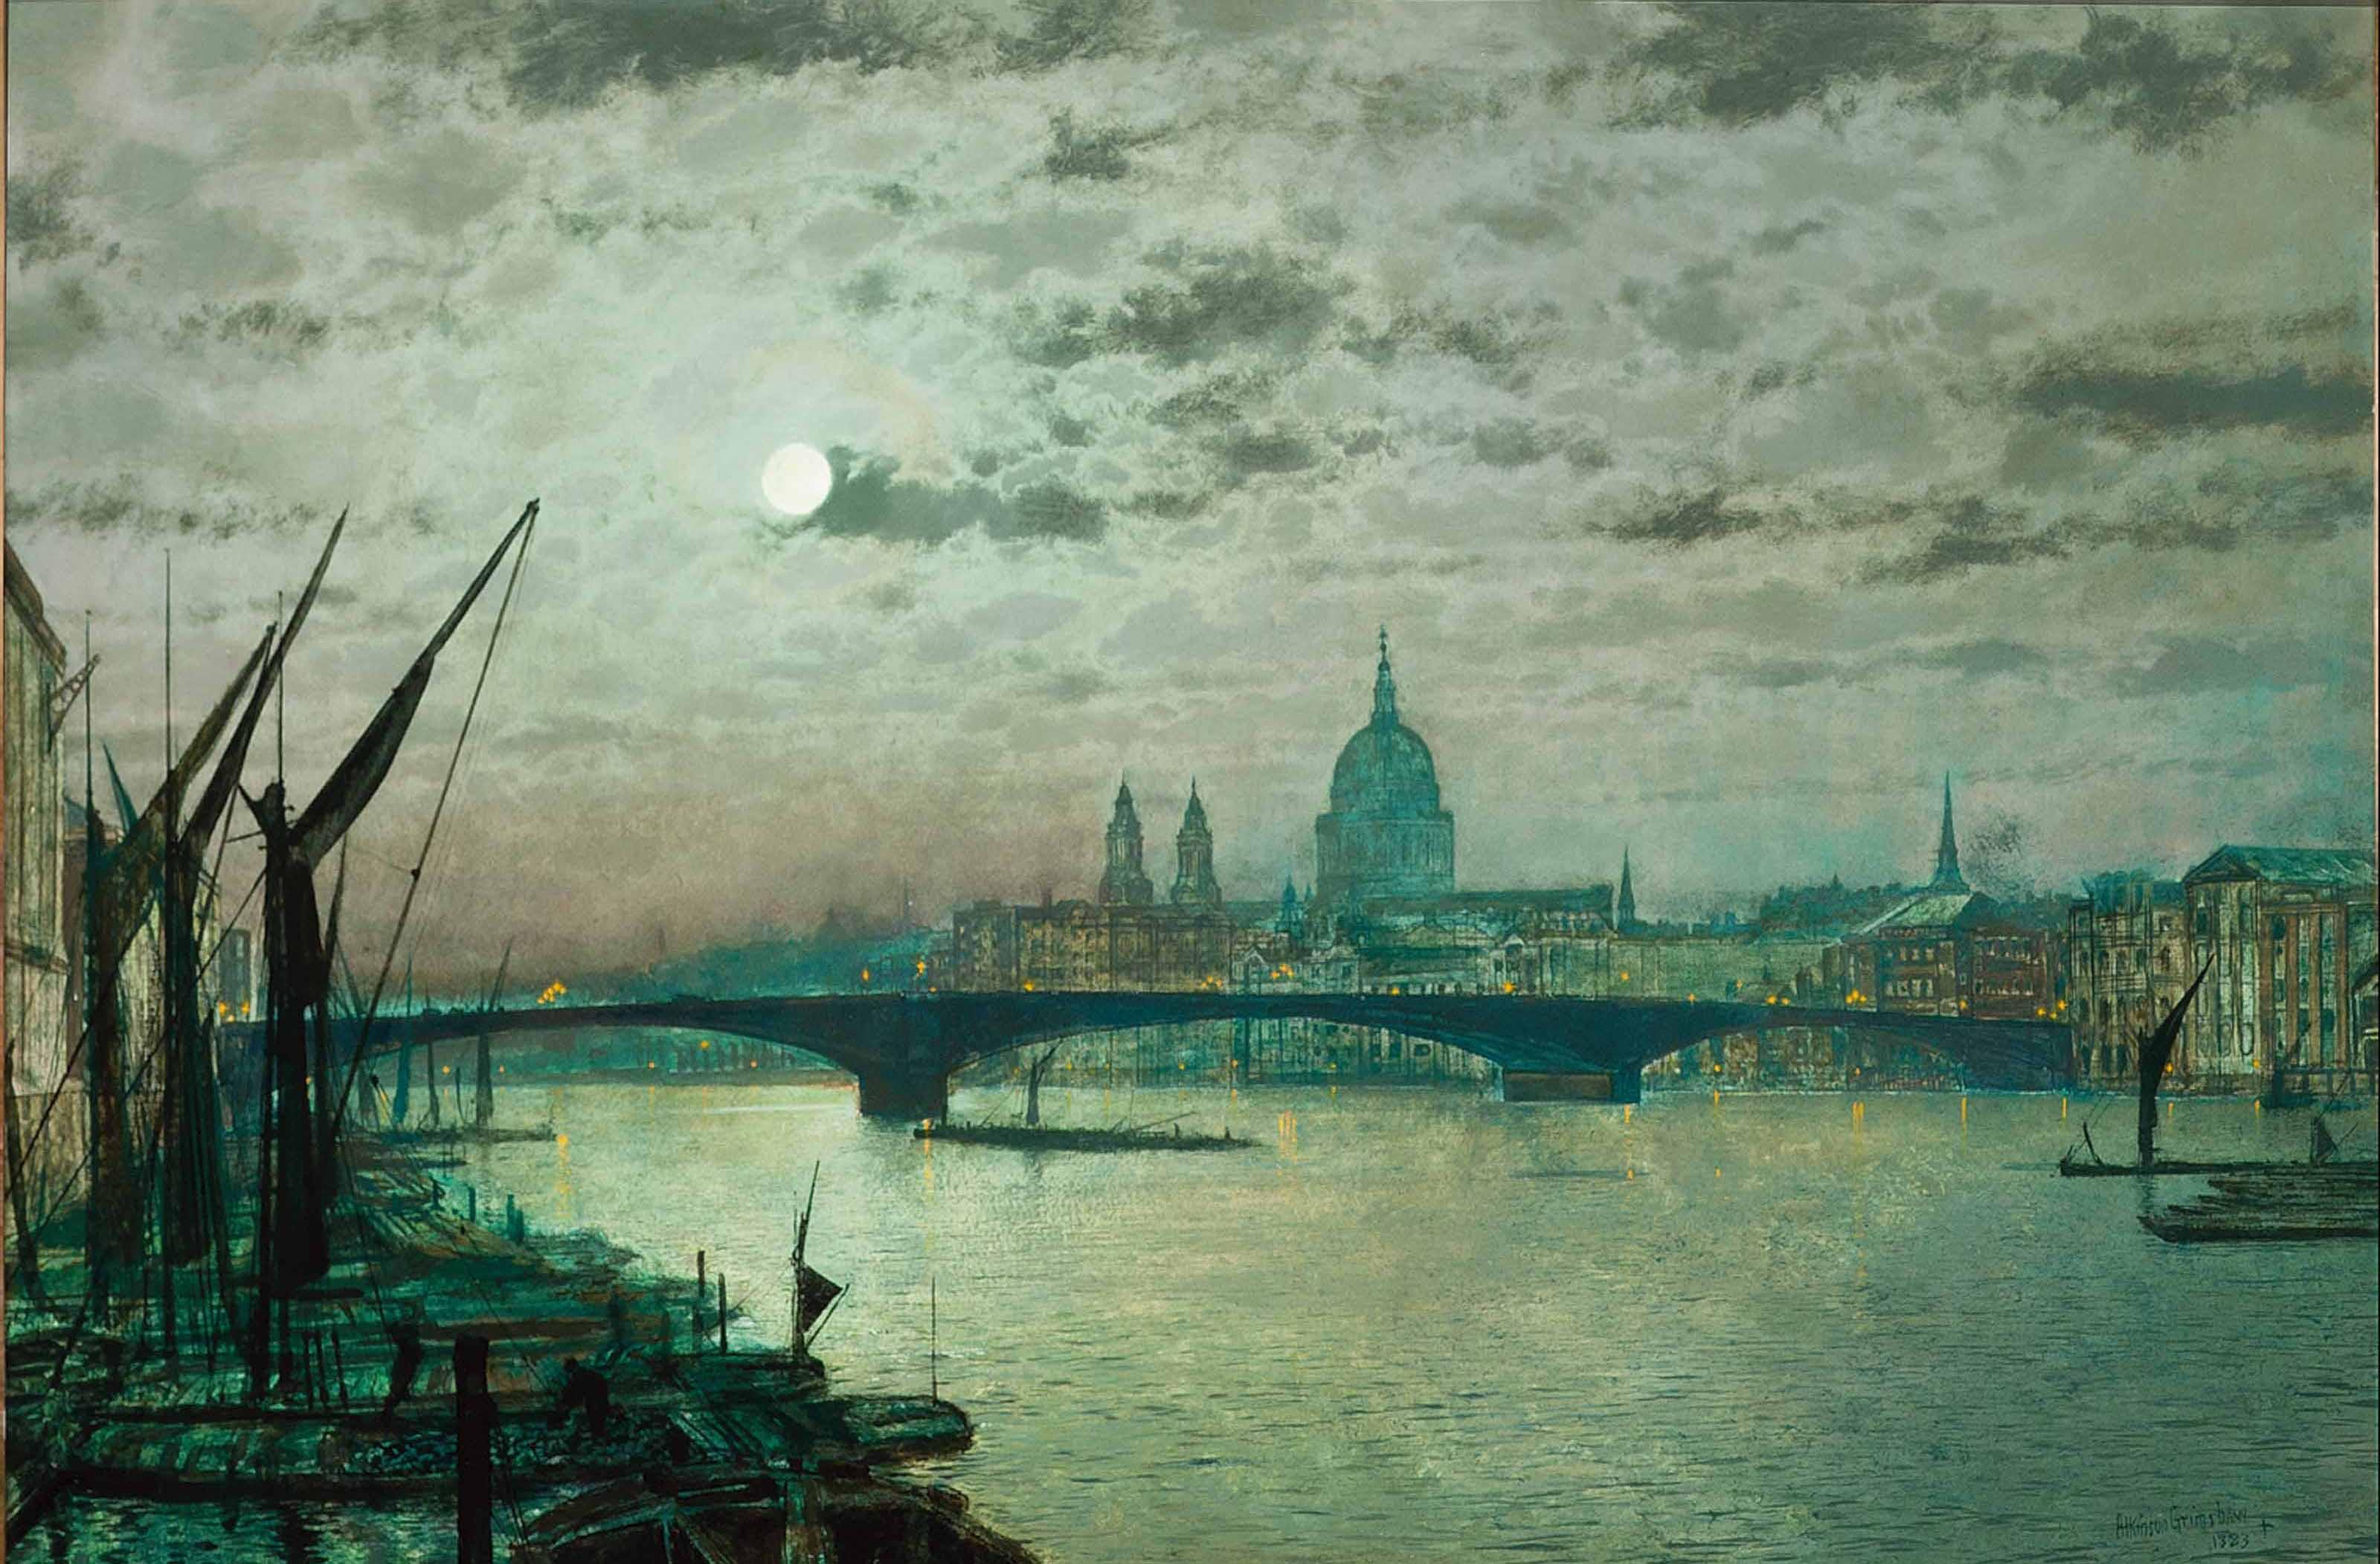 Southwark Bridge and St. Paul's